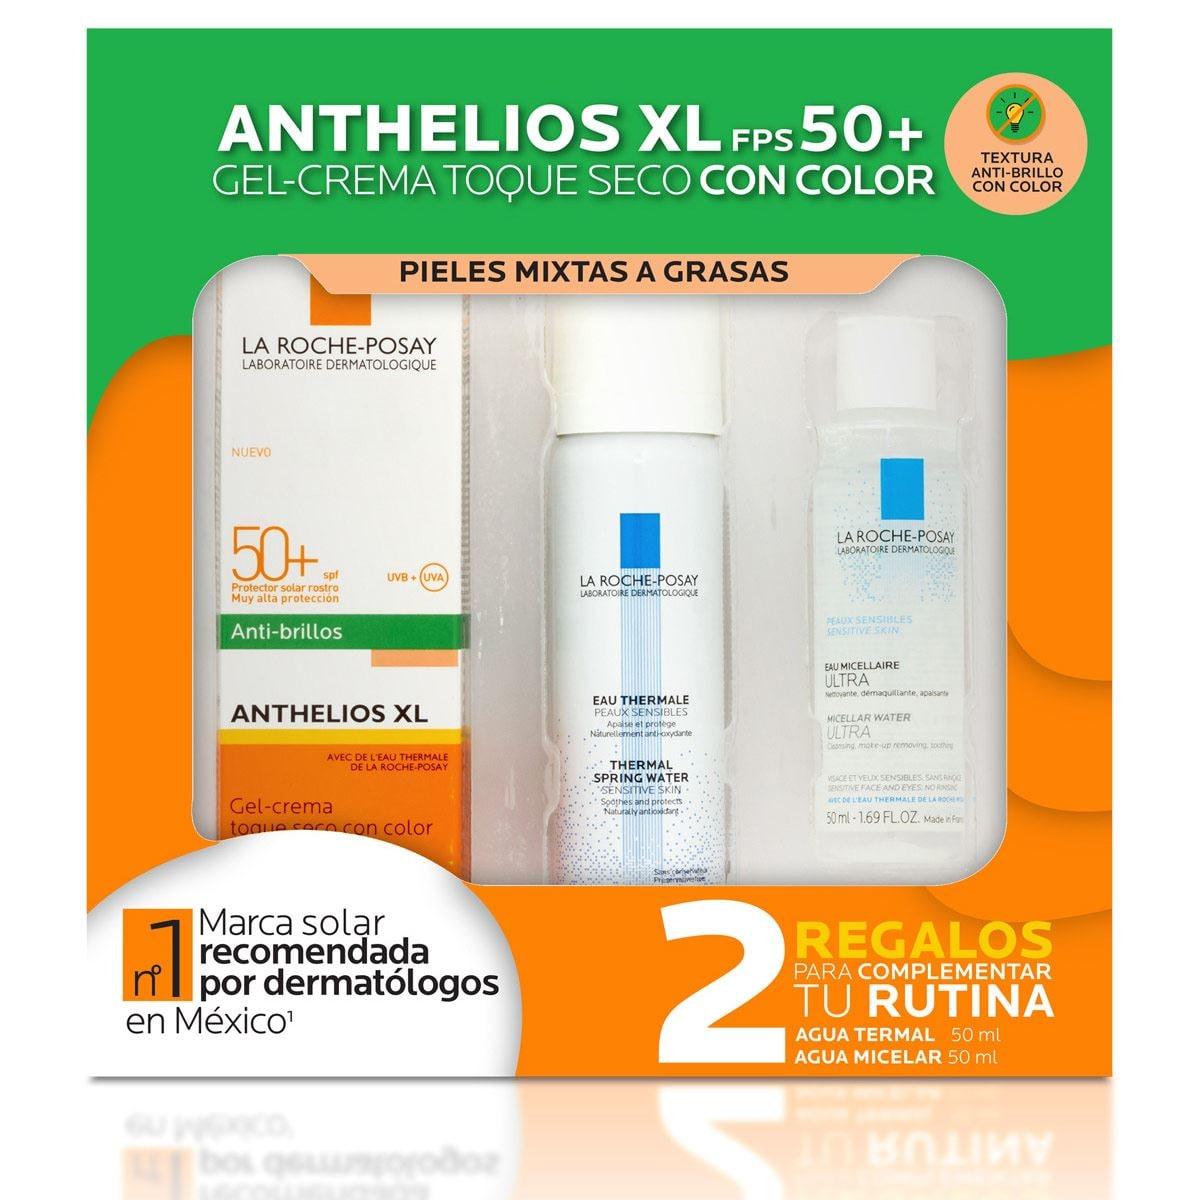 Pack Protector Solar Rostro Anthelios XL Toque Seco con color FPS 50+